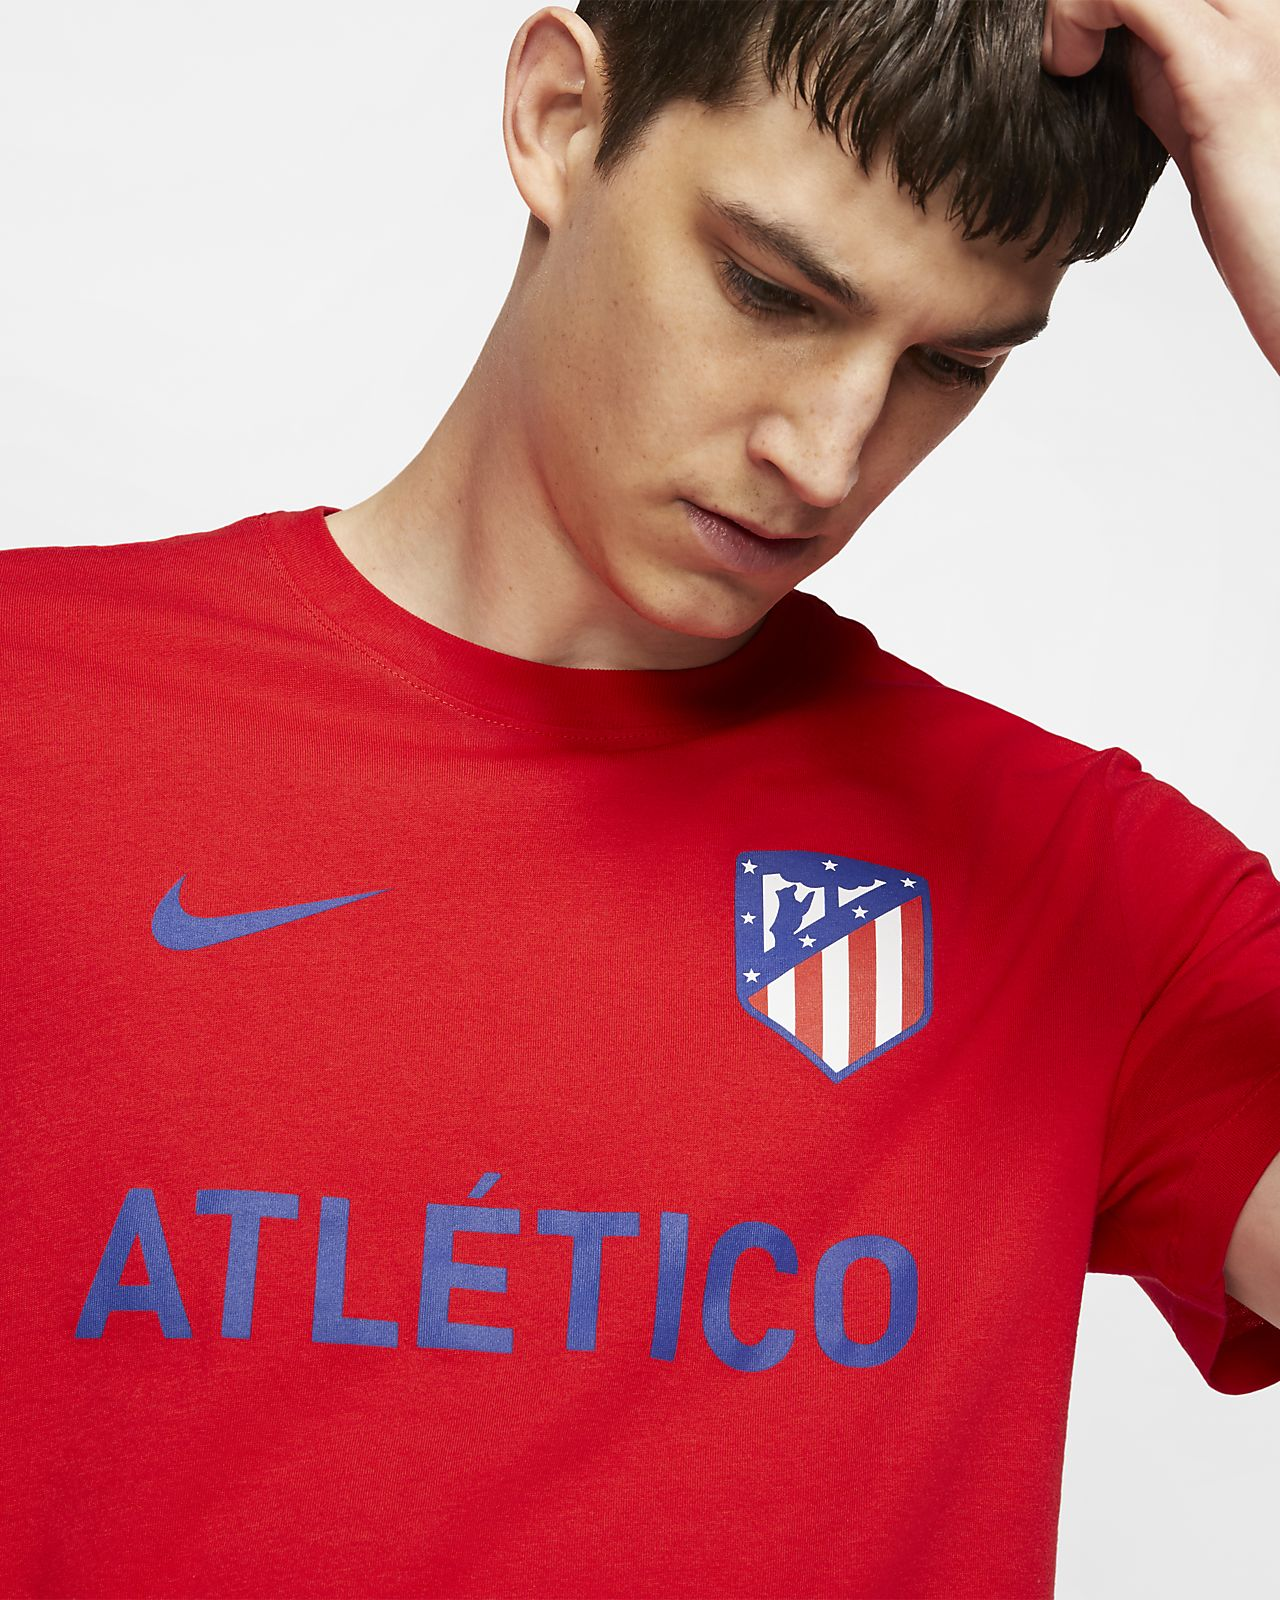 t shirt nike atlético de madrid